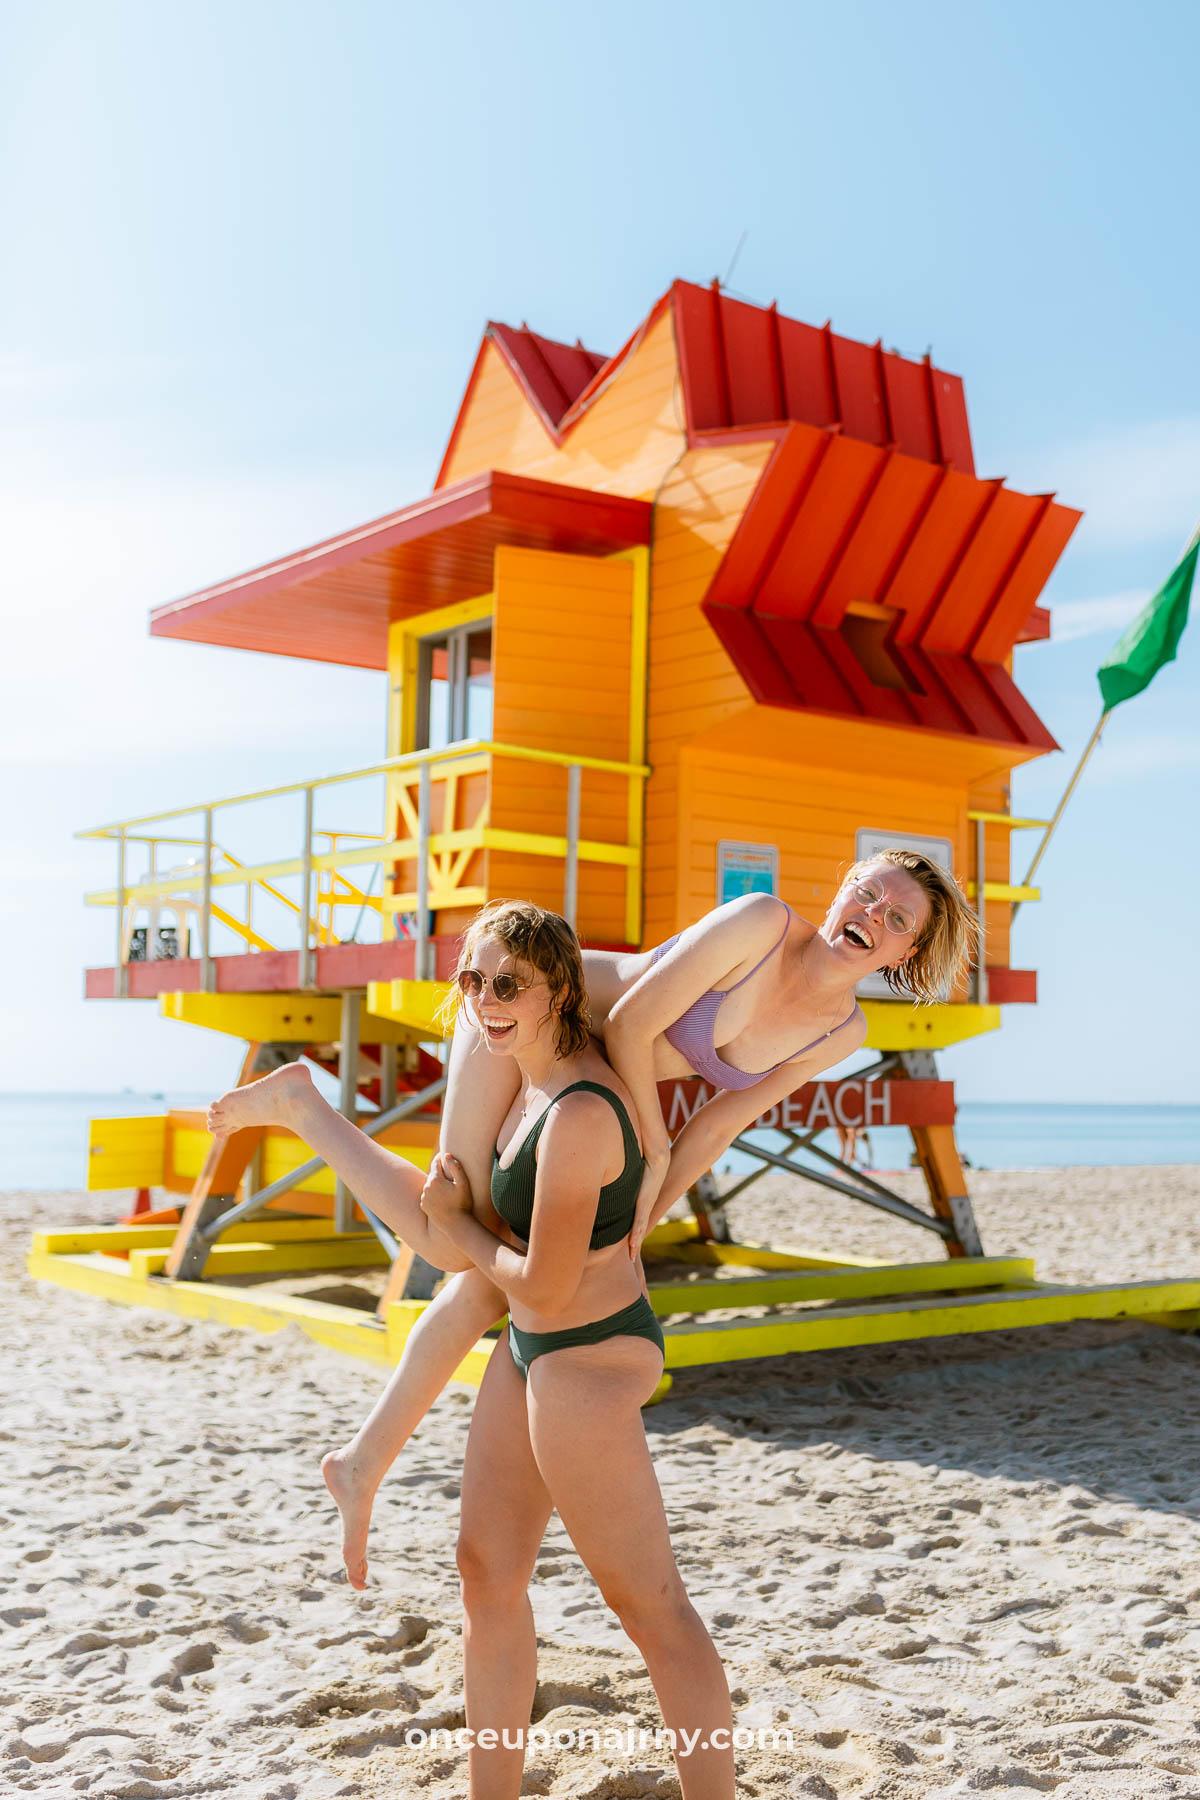 South Beach Lifeguard Tower Miami